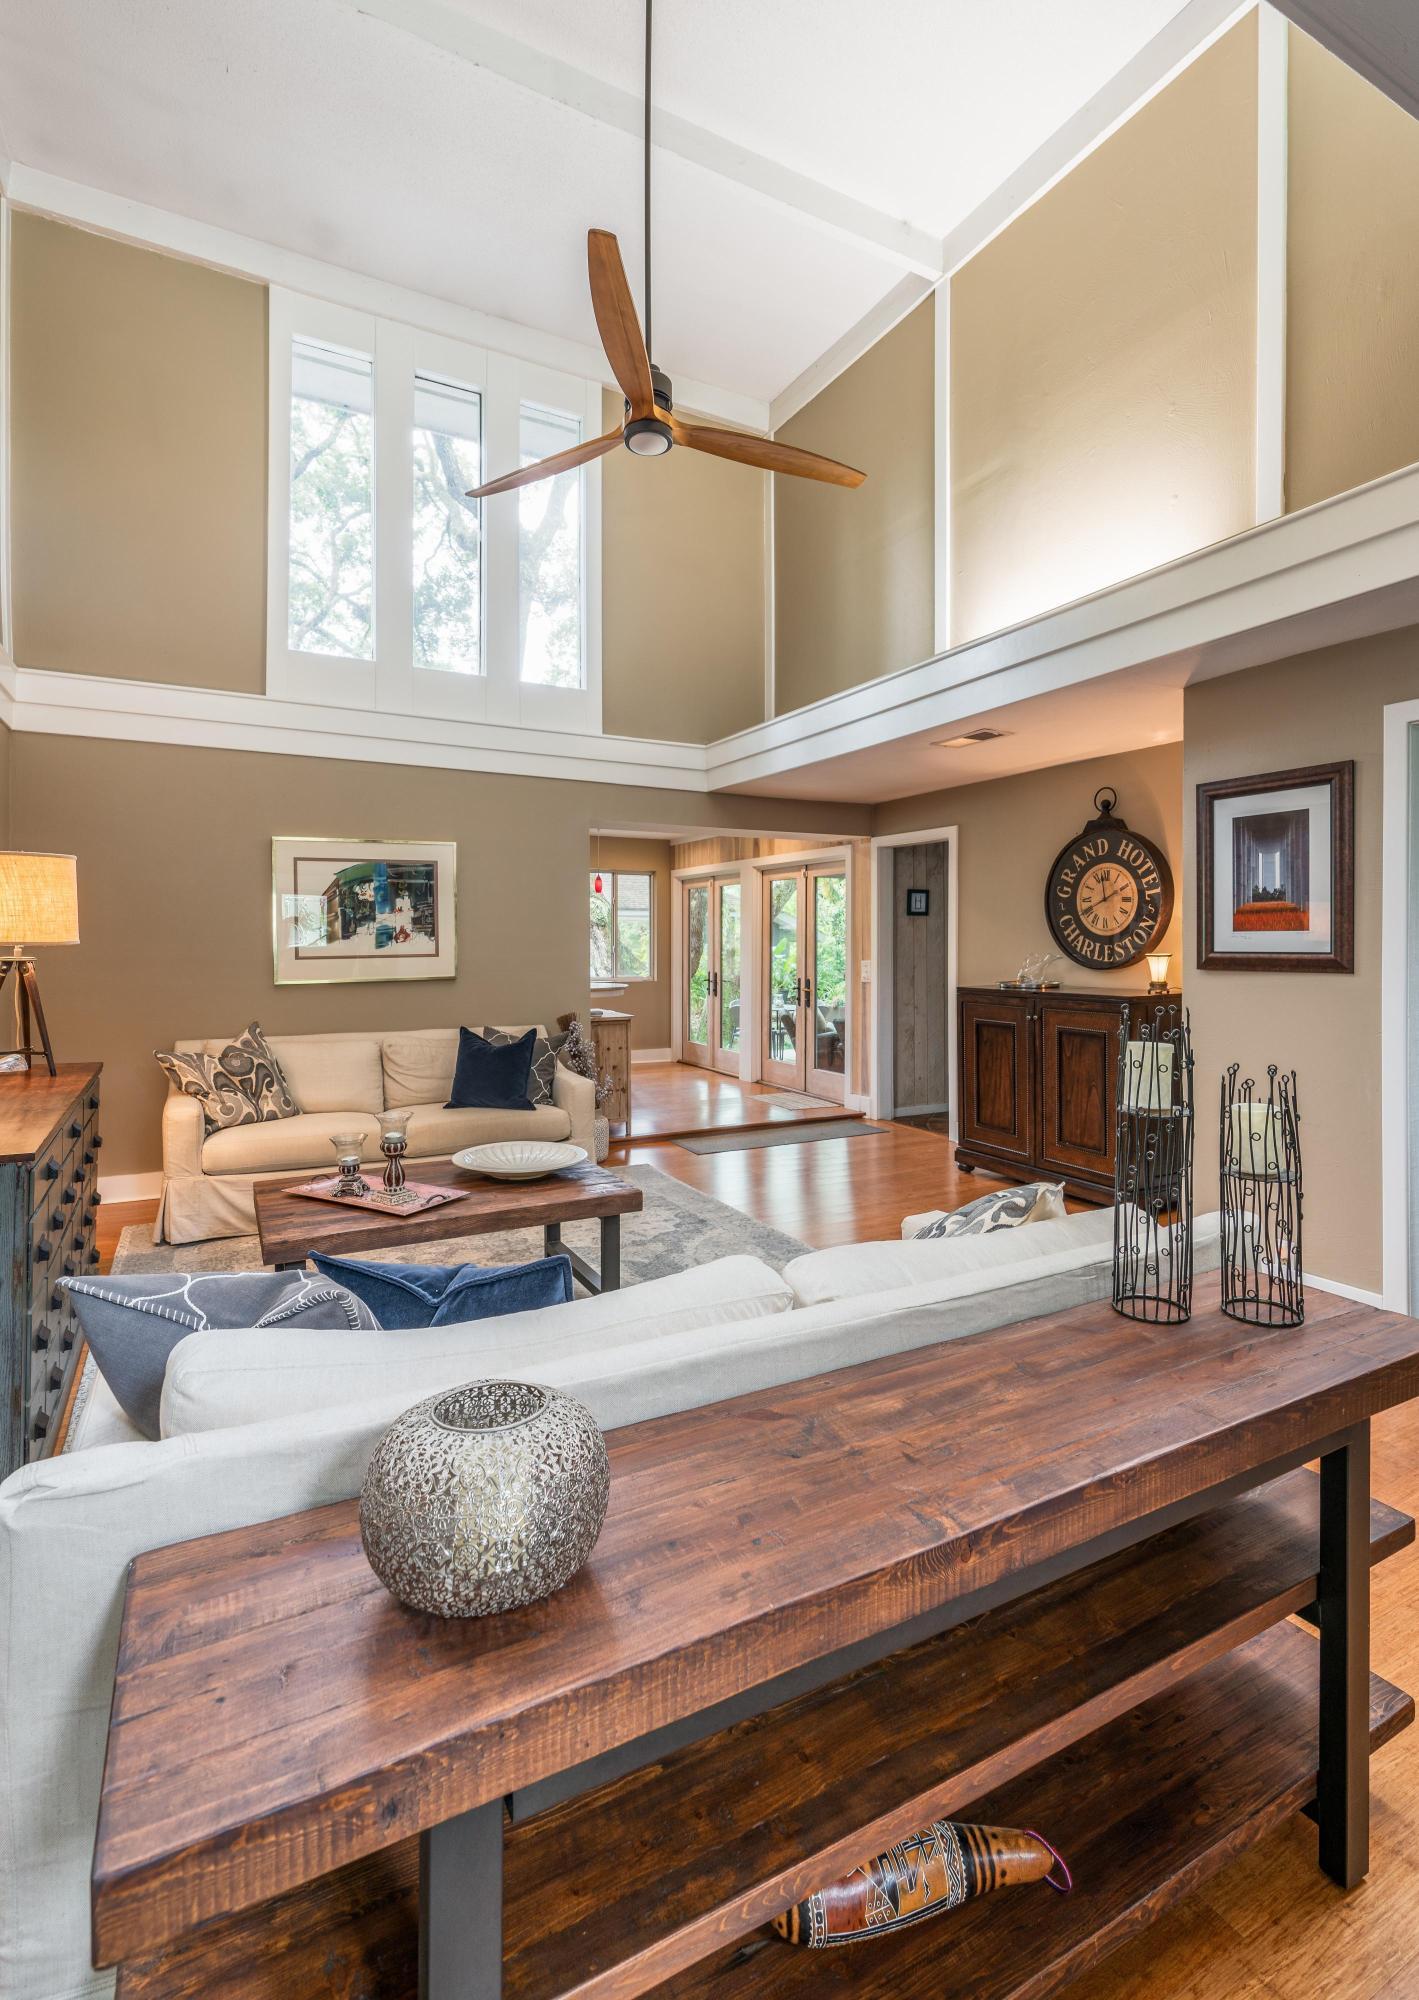 White Point Estates Homes For Sale - 894 White Point, Charleston, SC - 38